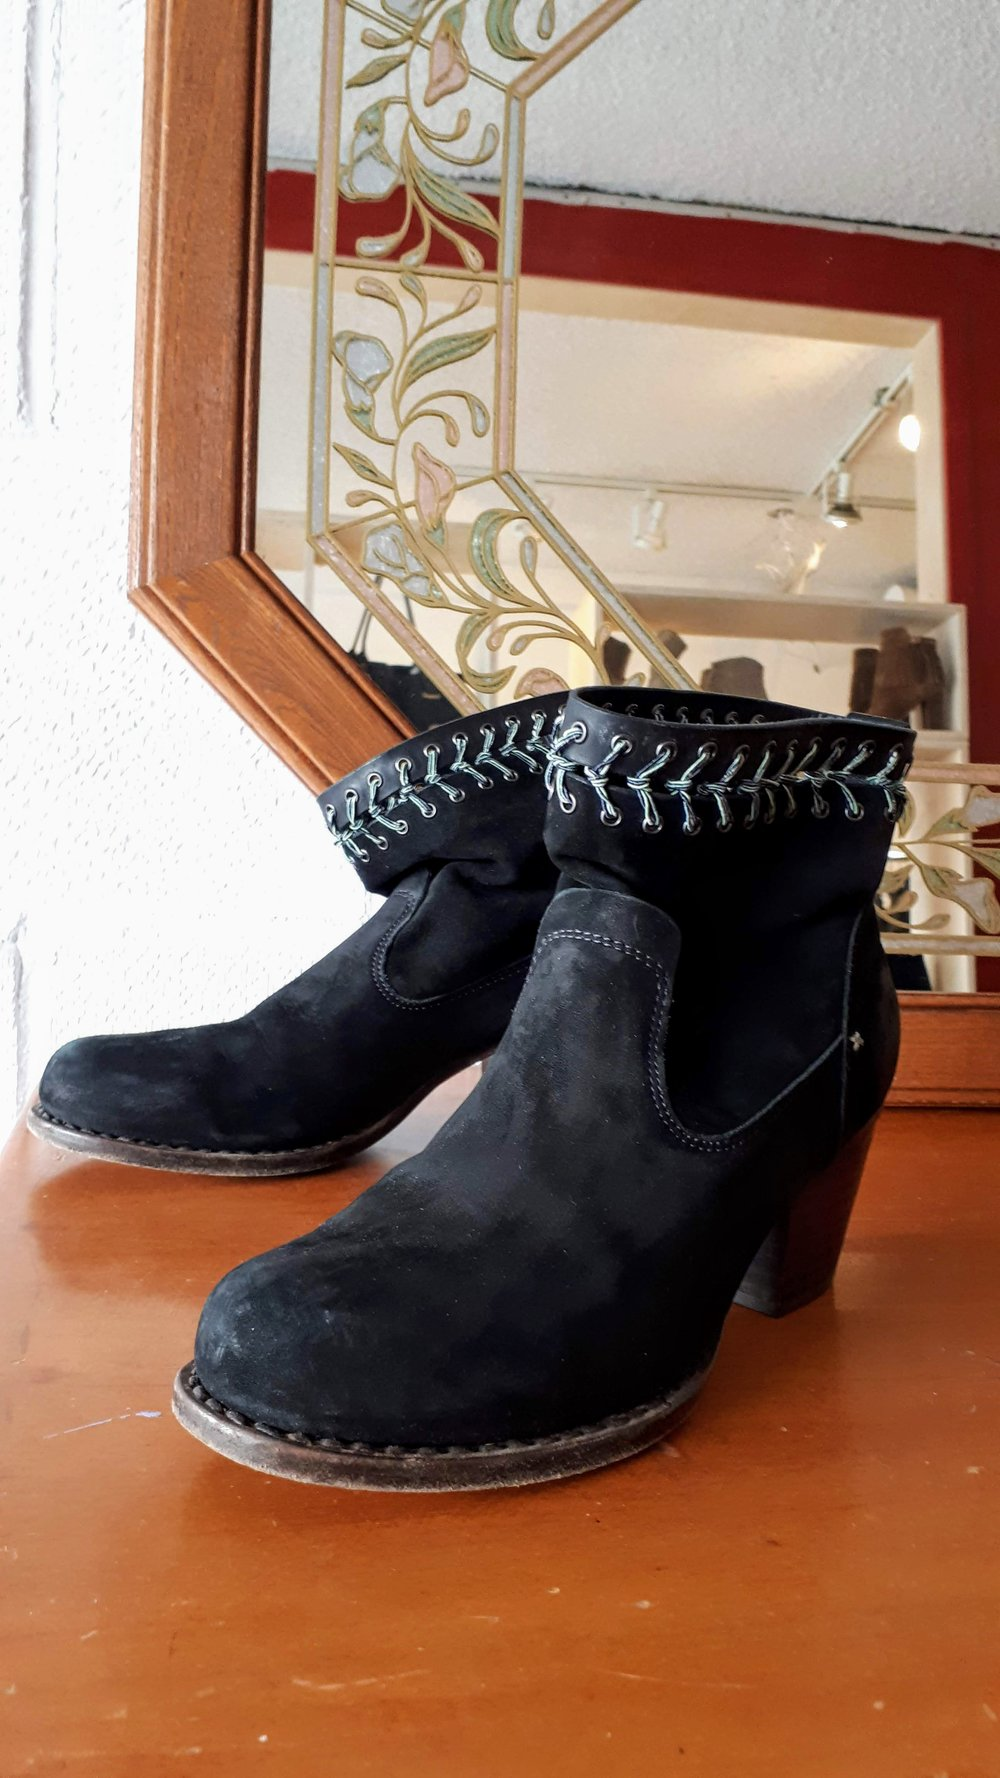 Rag & Bone boots; Size 6 $85